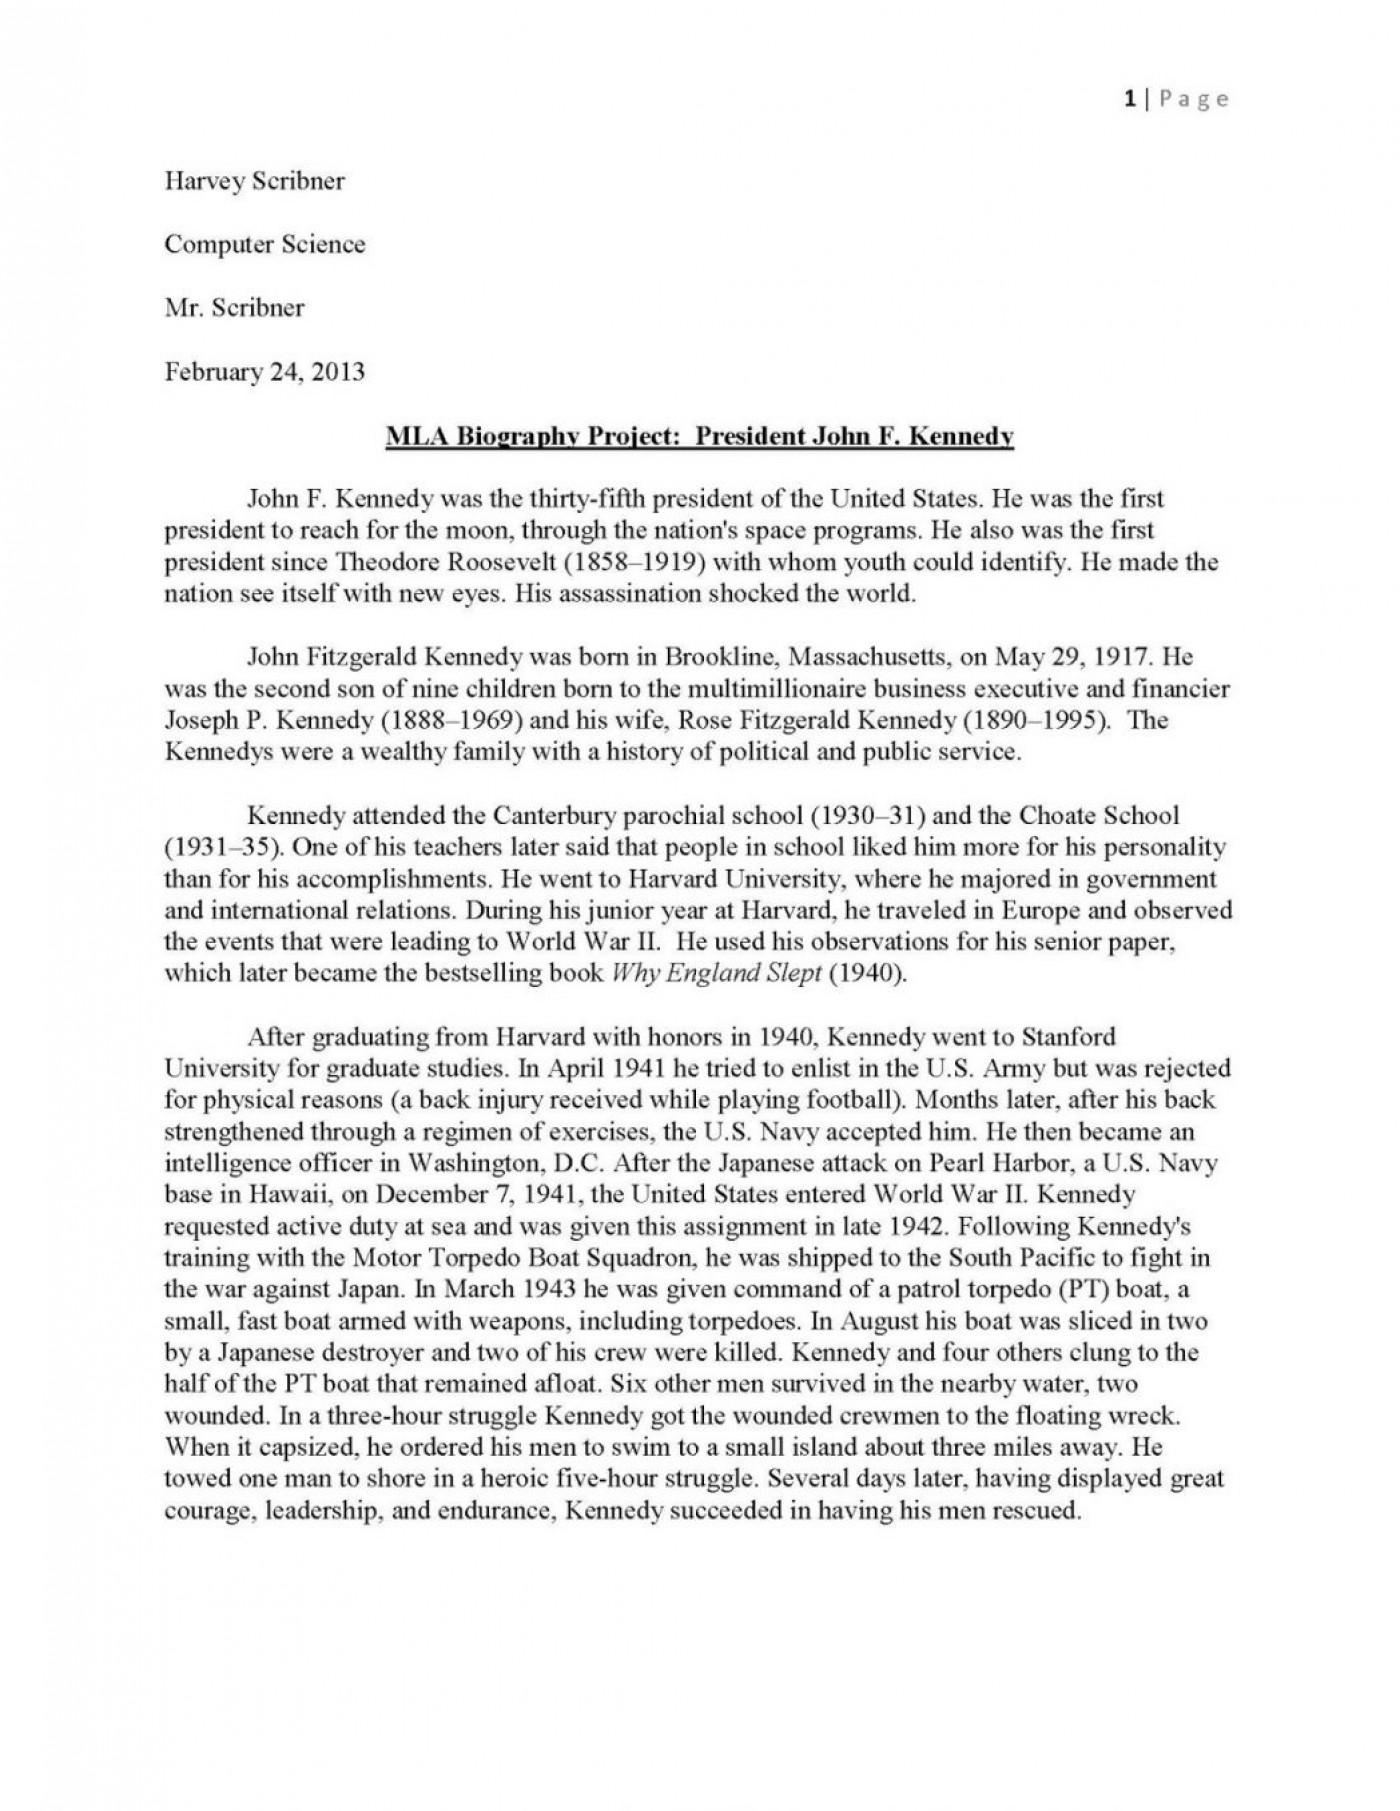 Greenpeace global warming report paper